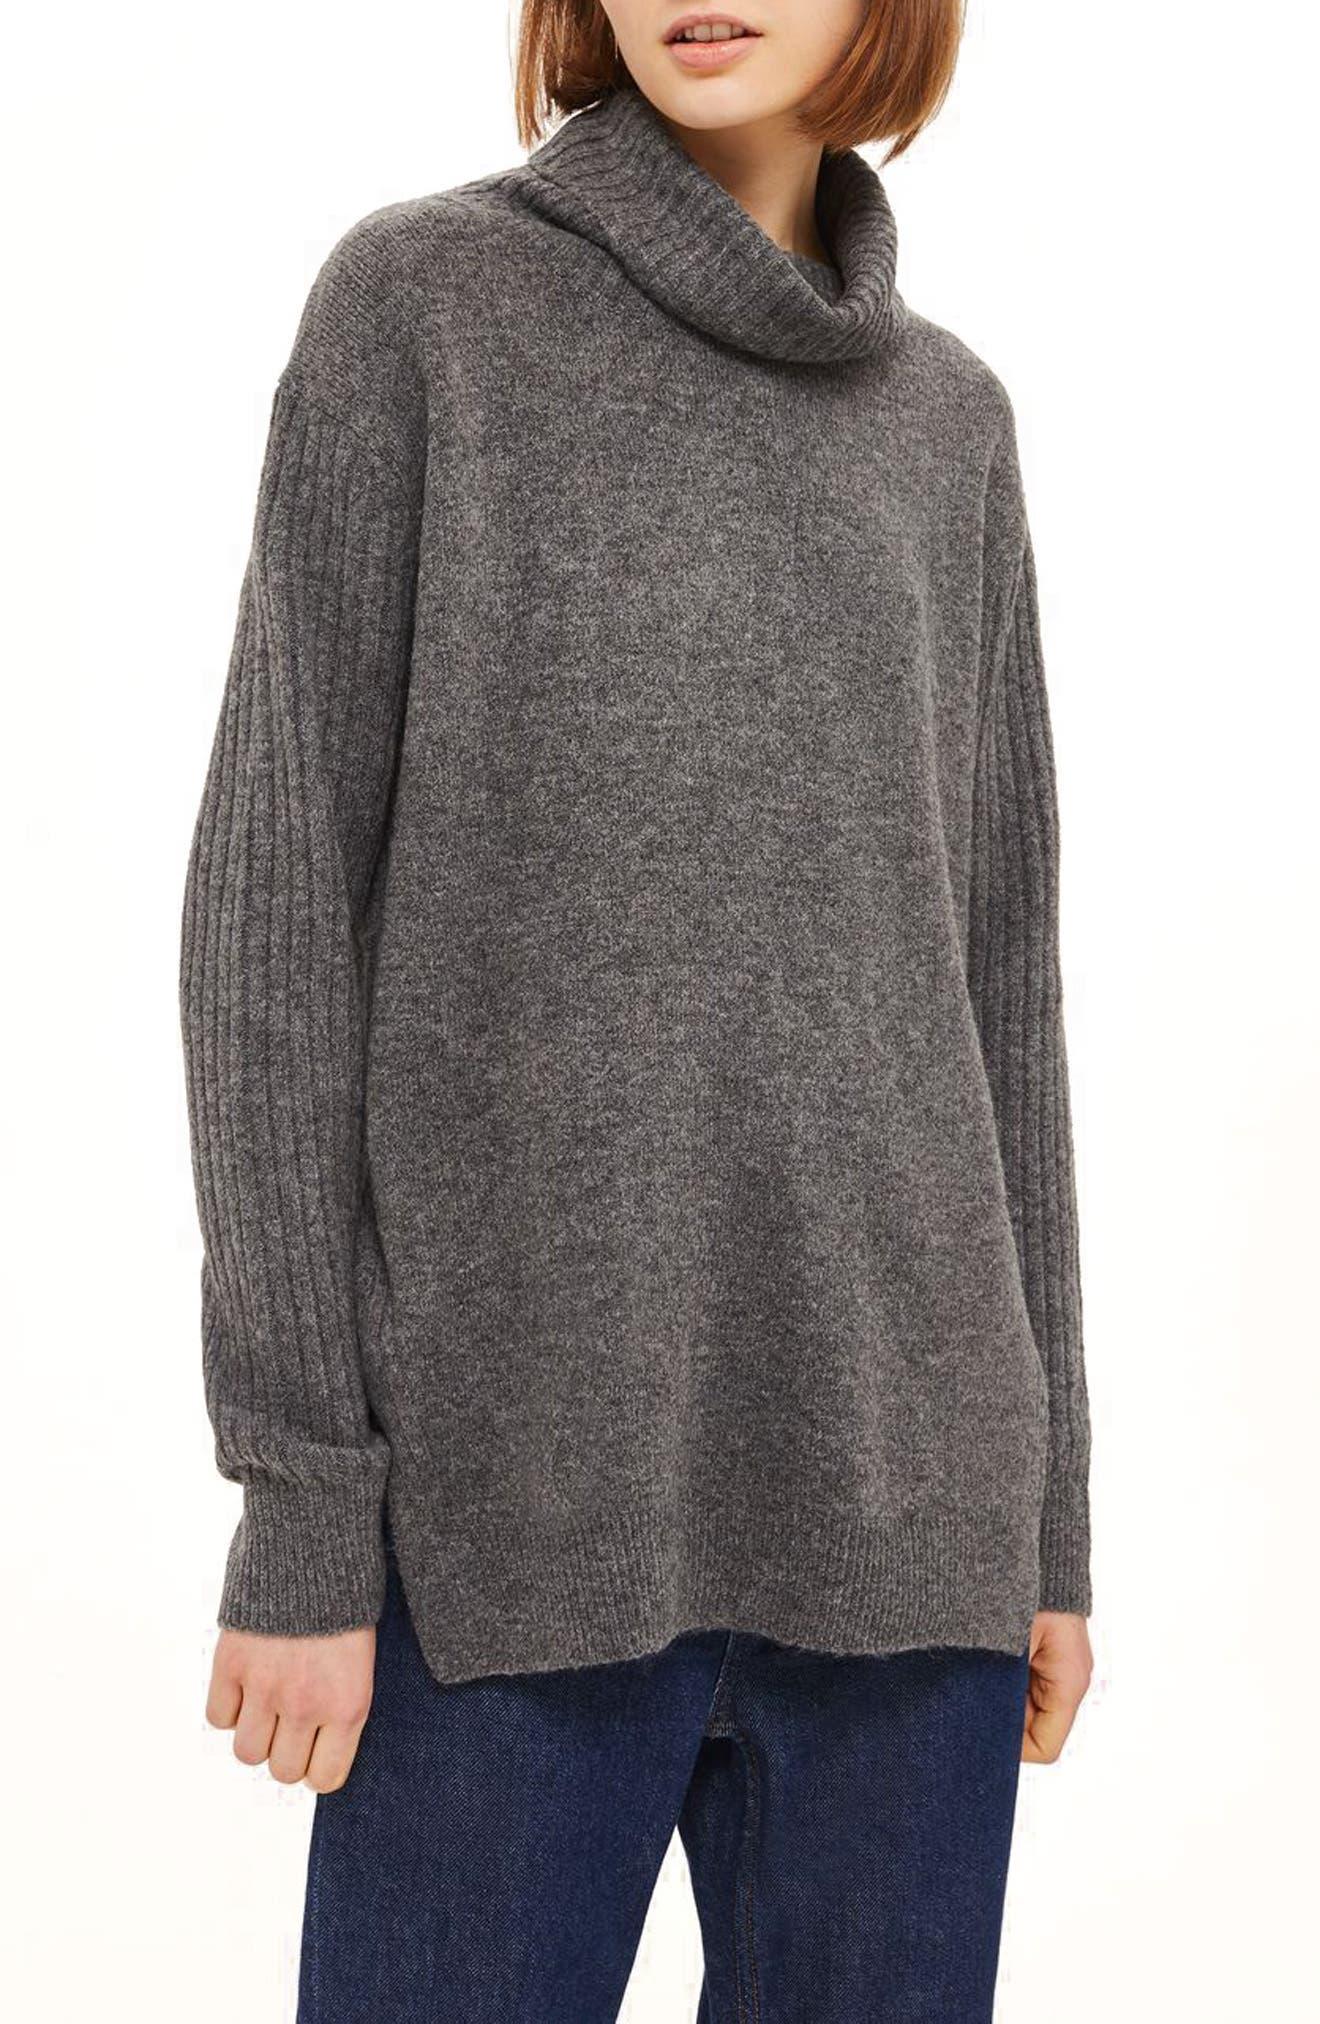 Topshop Oversize Funnel Neck Sweater